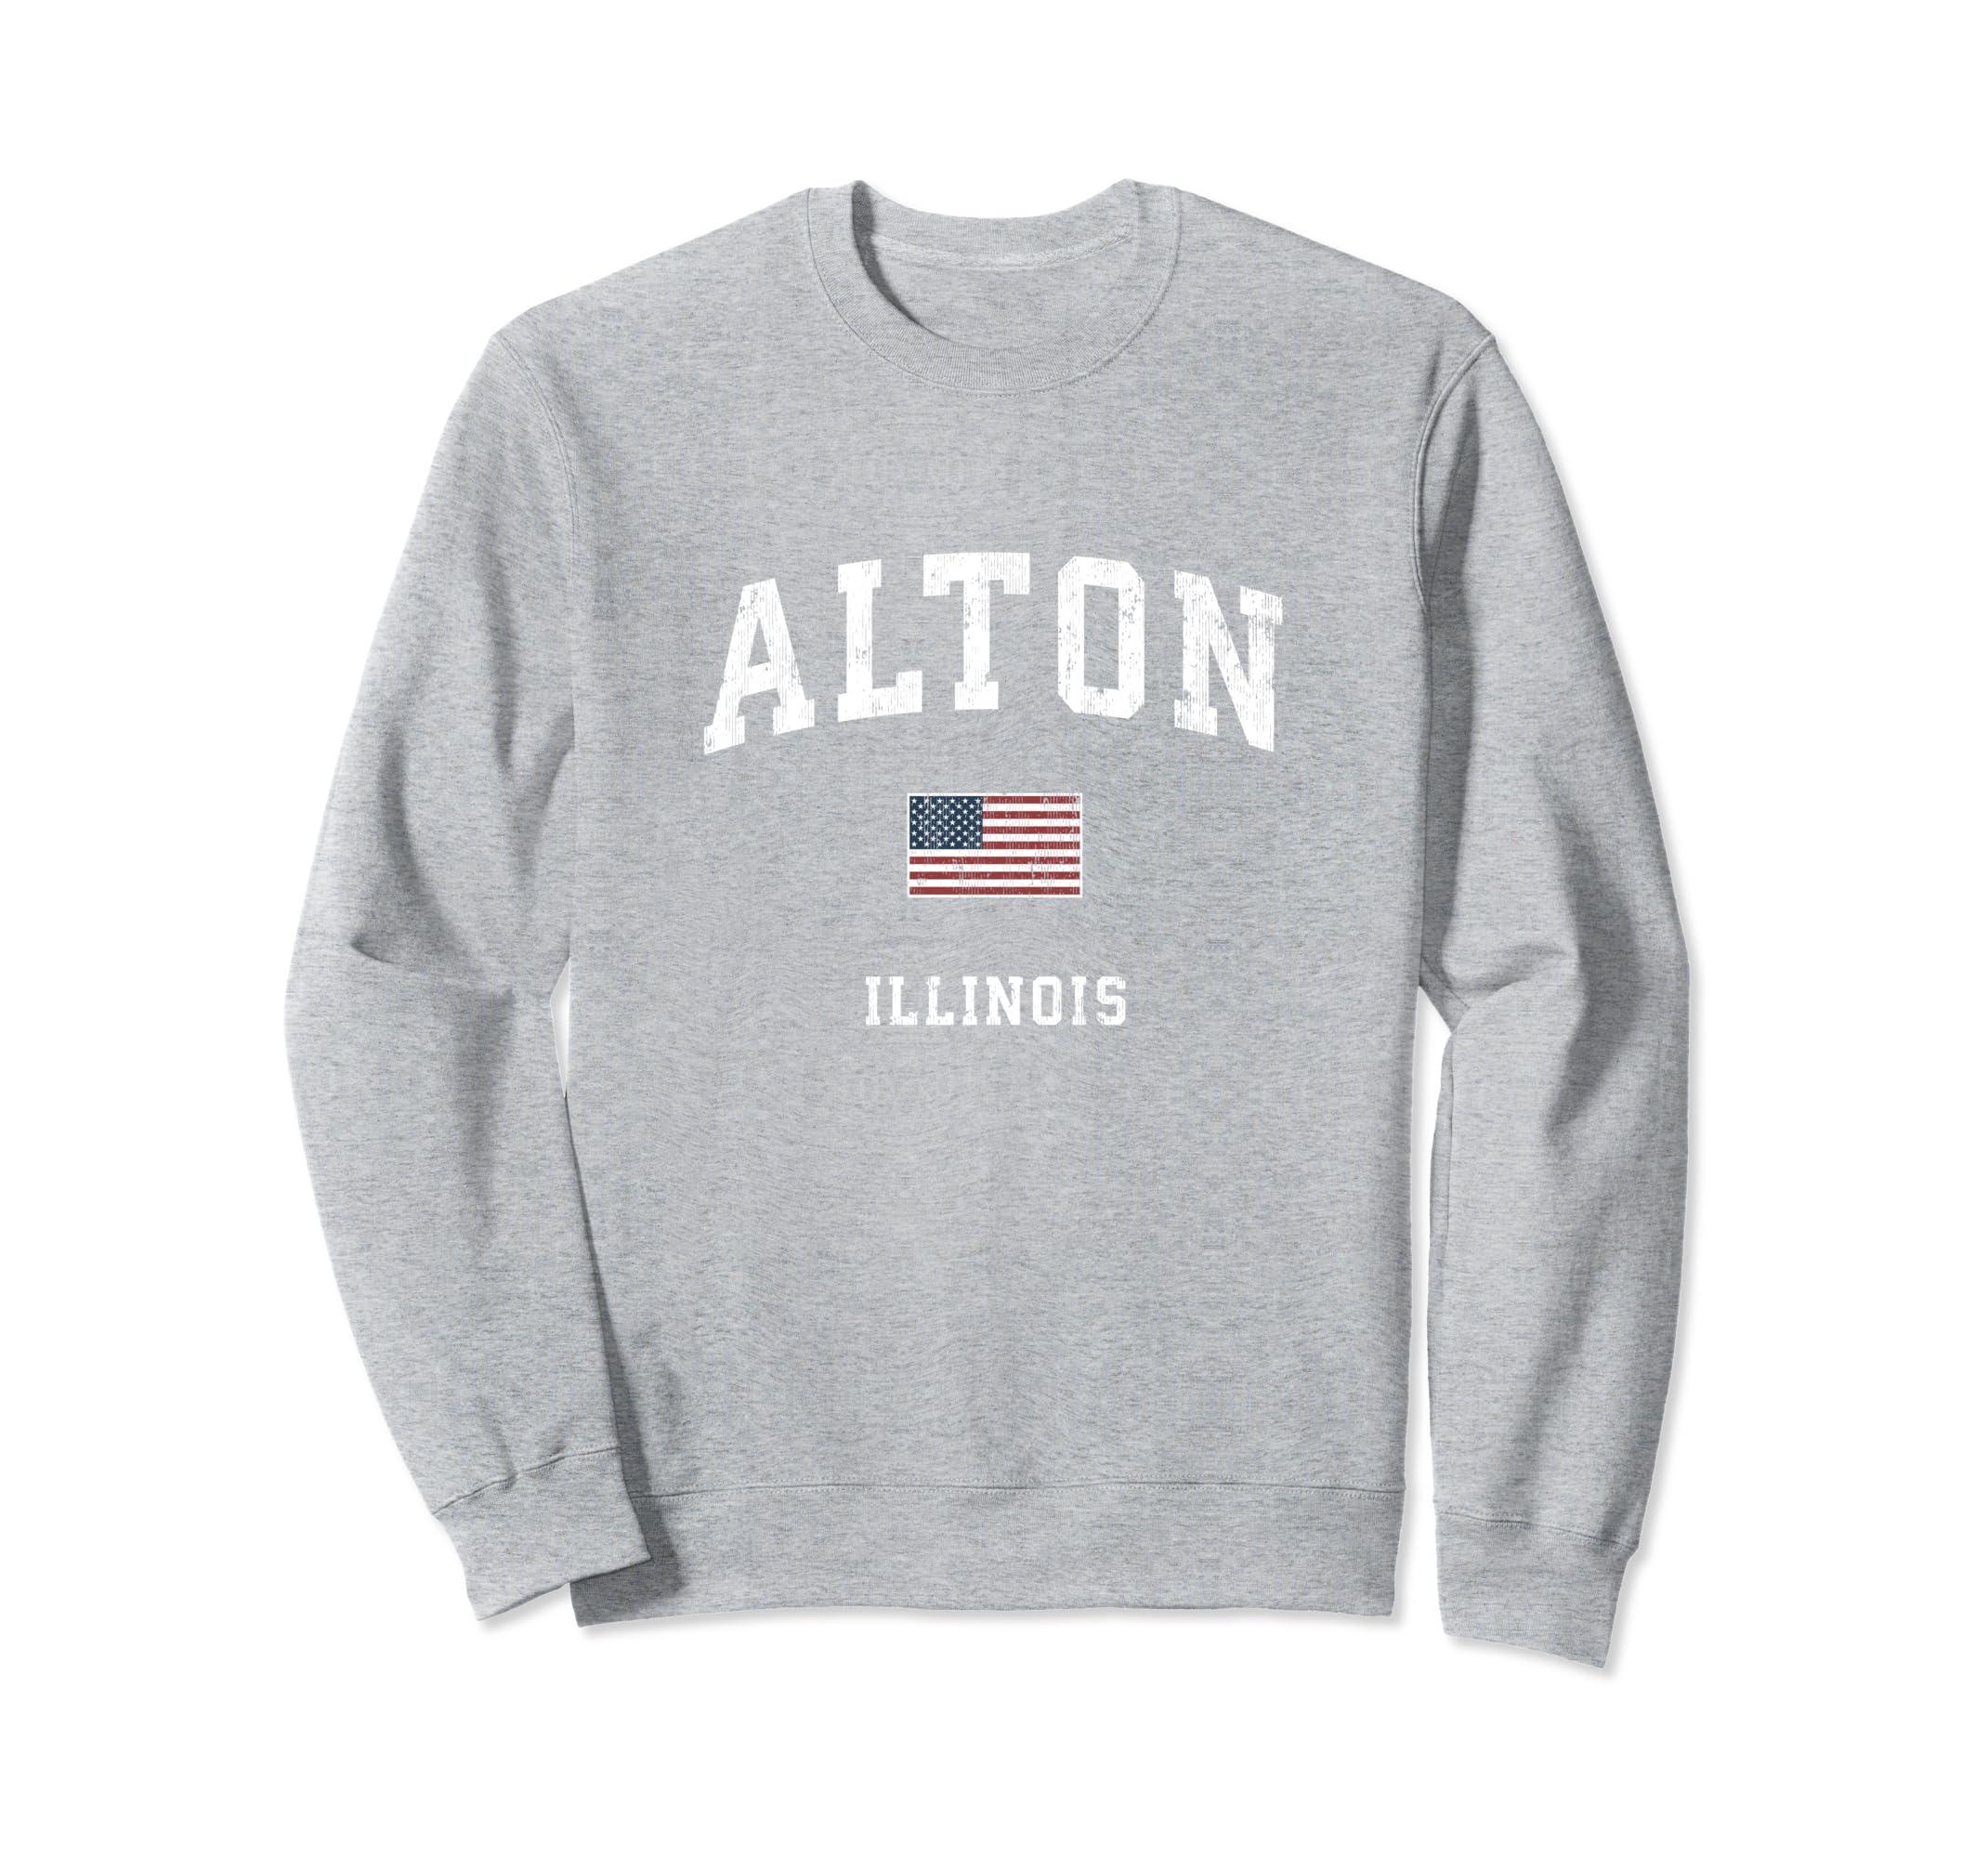 Alton Illinois IL Vintage American Flag Sports Design Sweatshirt-ANZ